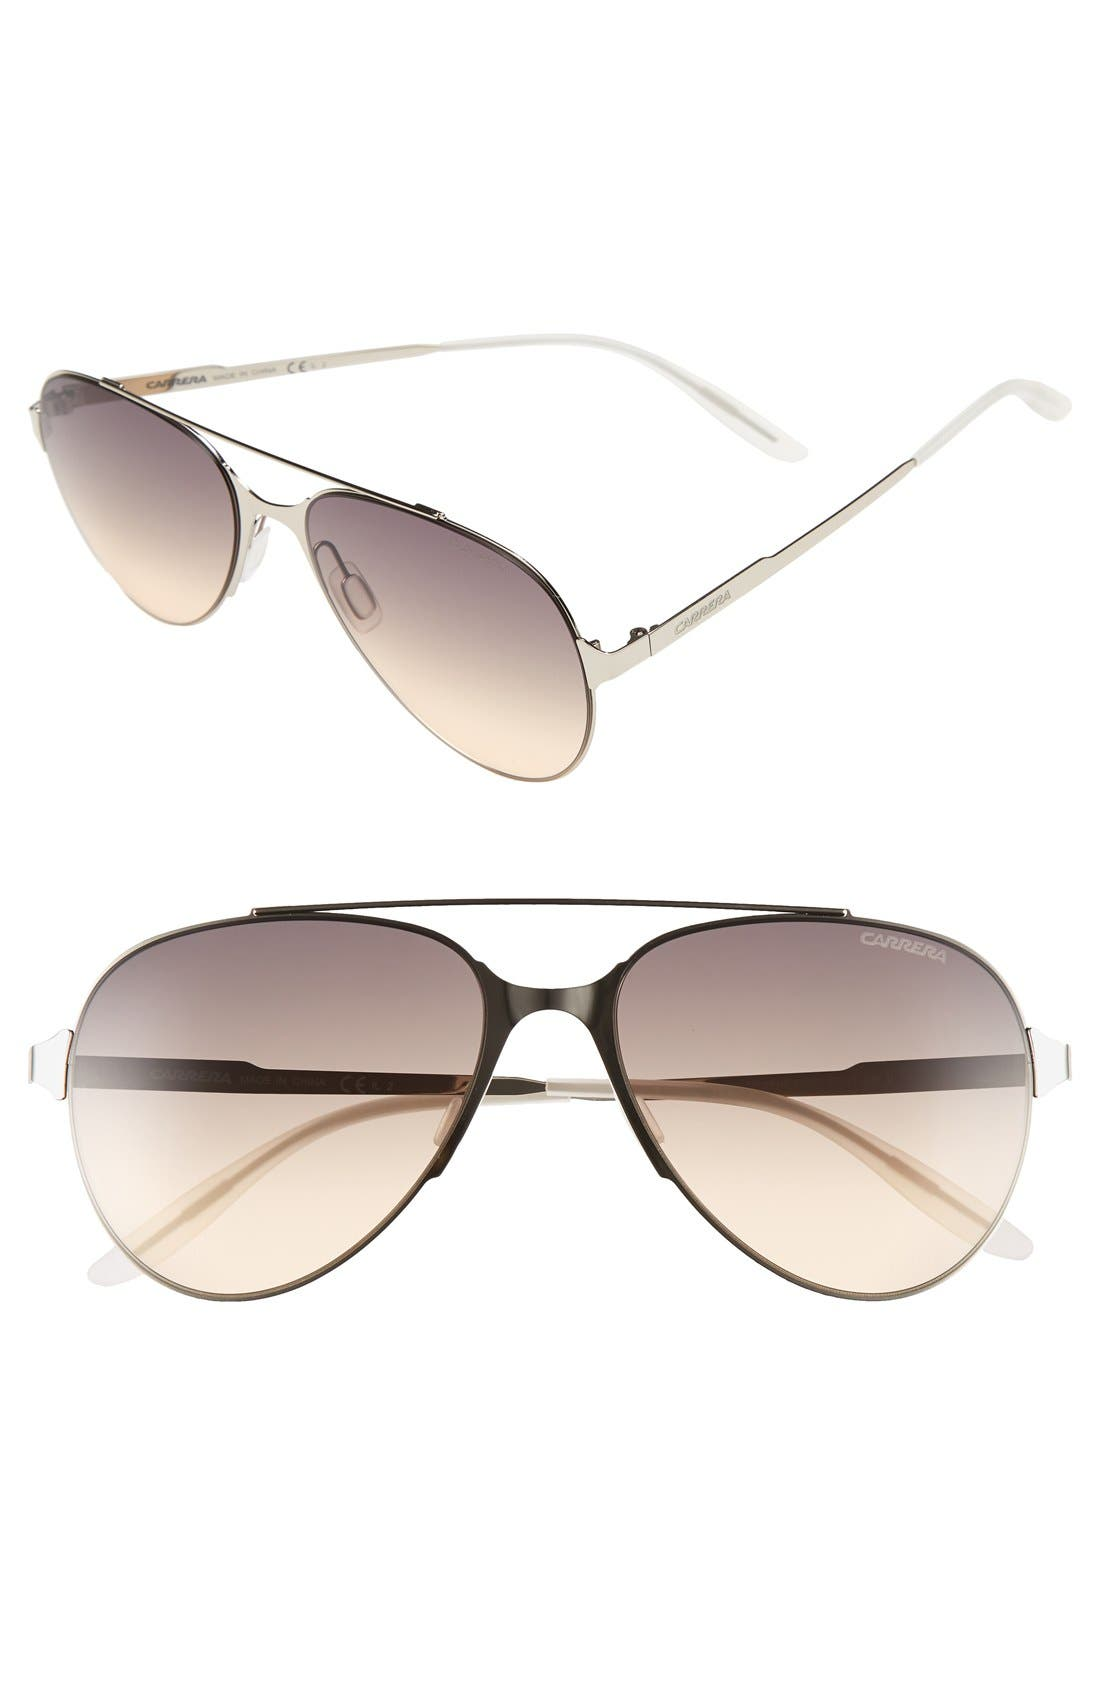 '113/S' Aviator Sunglasses,                         Main,                         color, Matte Light Gold/ Dark Grey